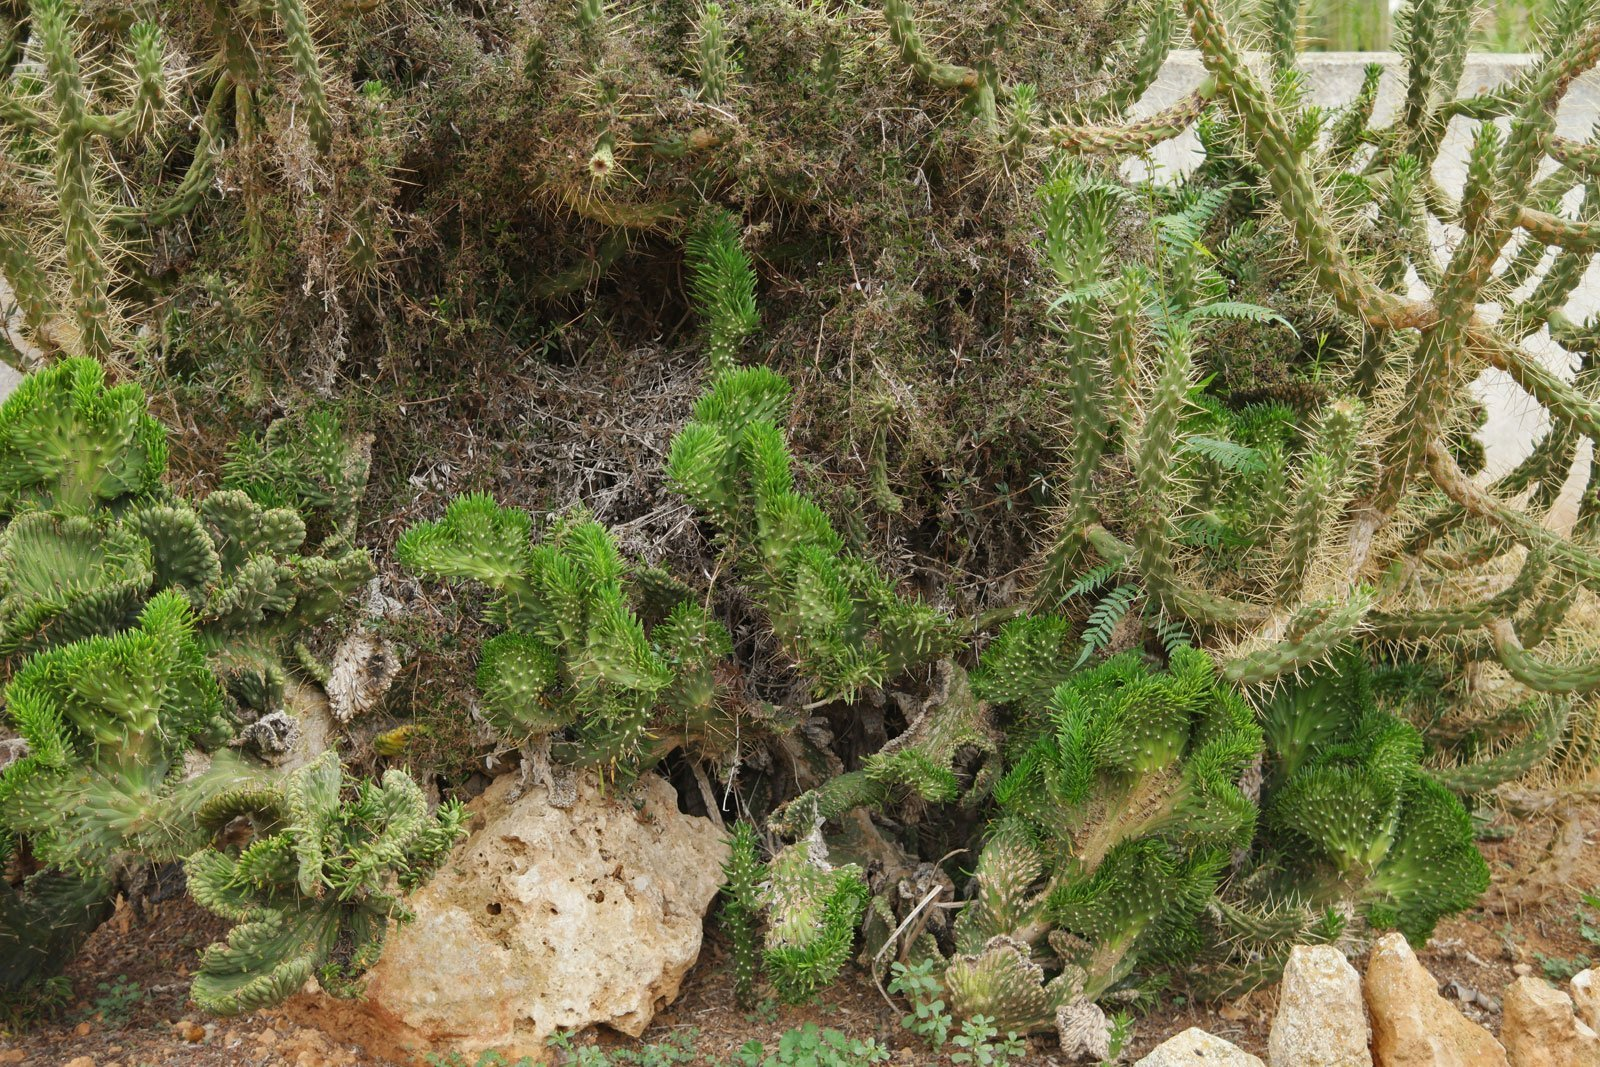 Austrocylindropuntia subulata Cristata